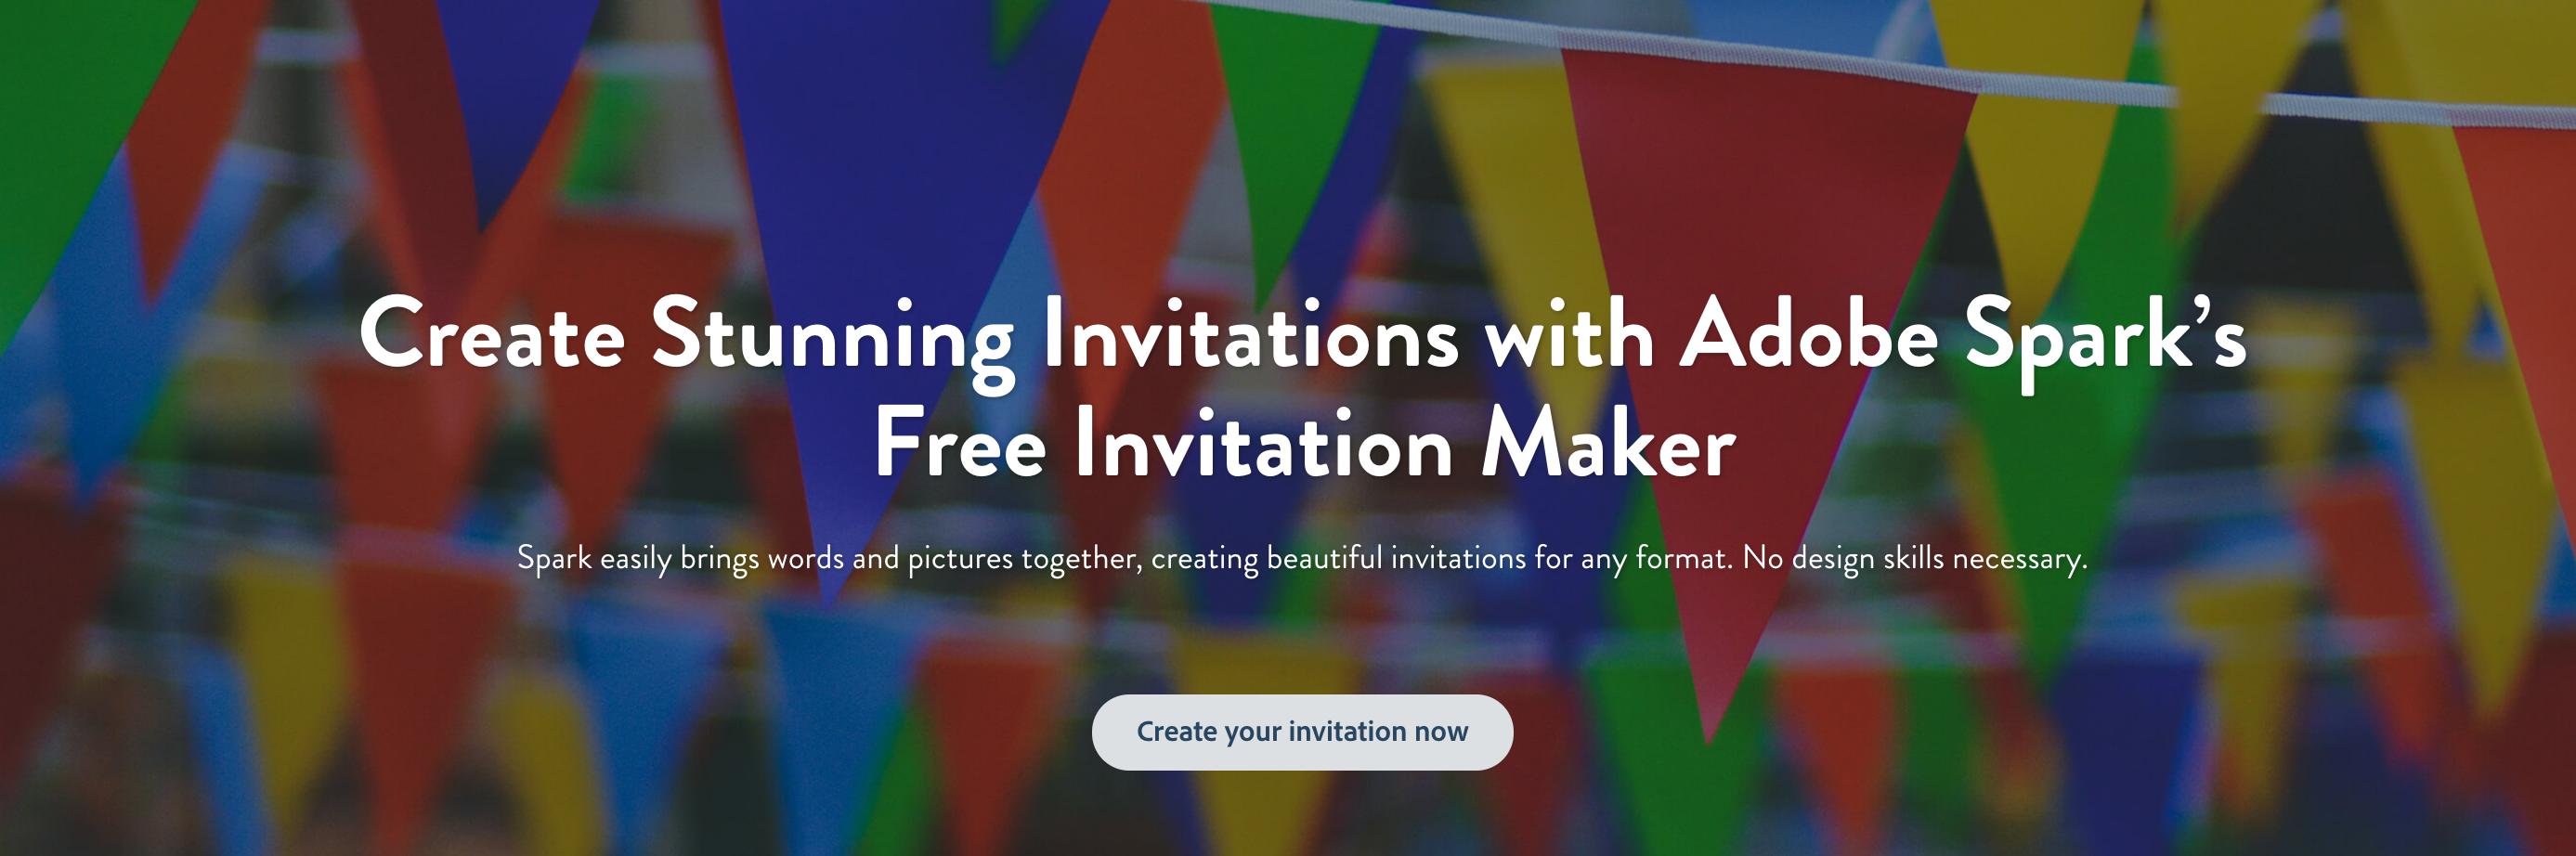 adobe spark u2019s free online invitation maker helps you